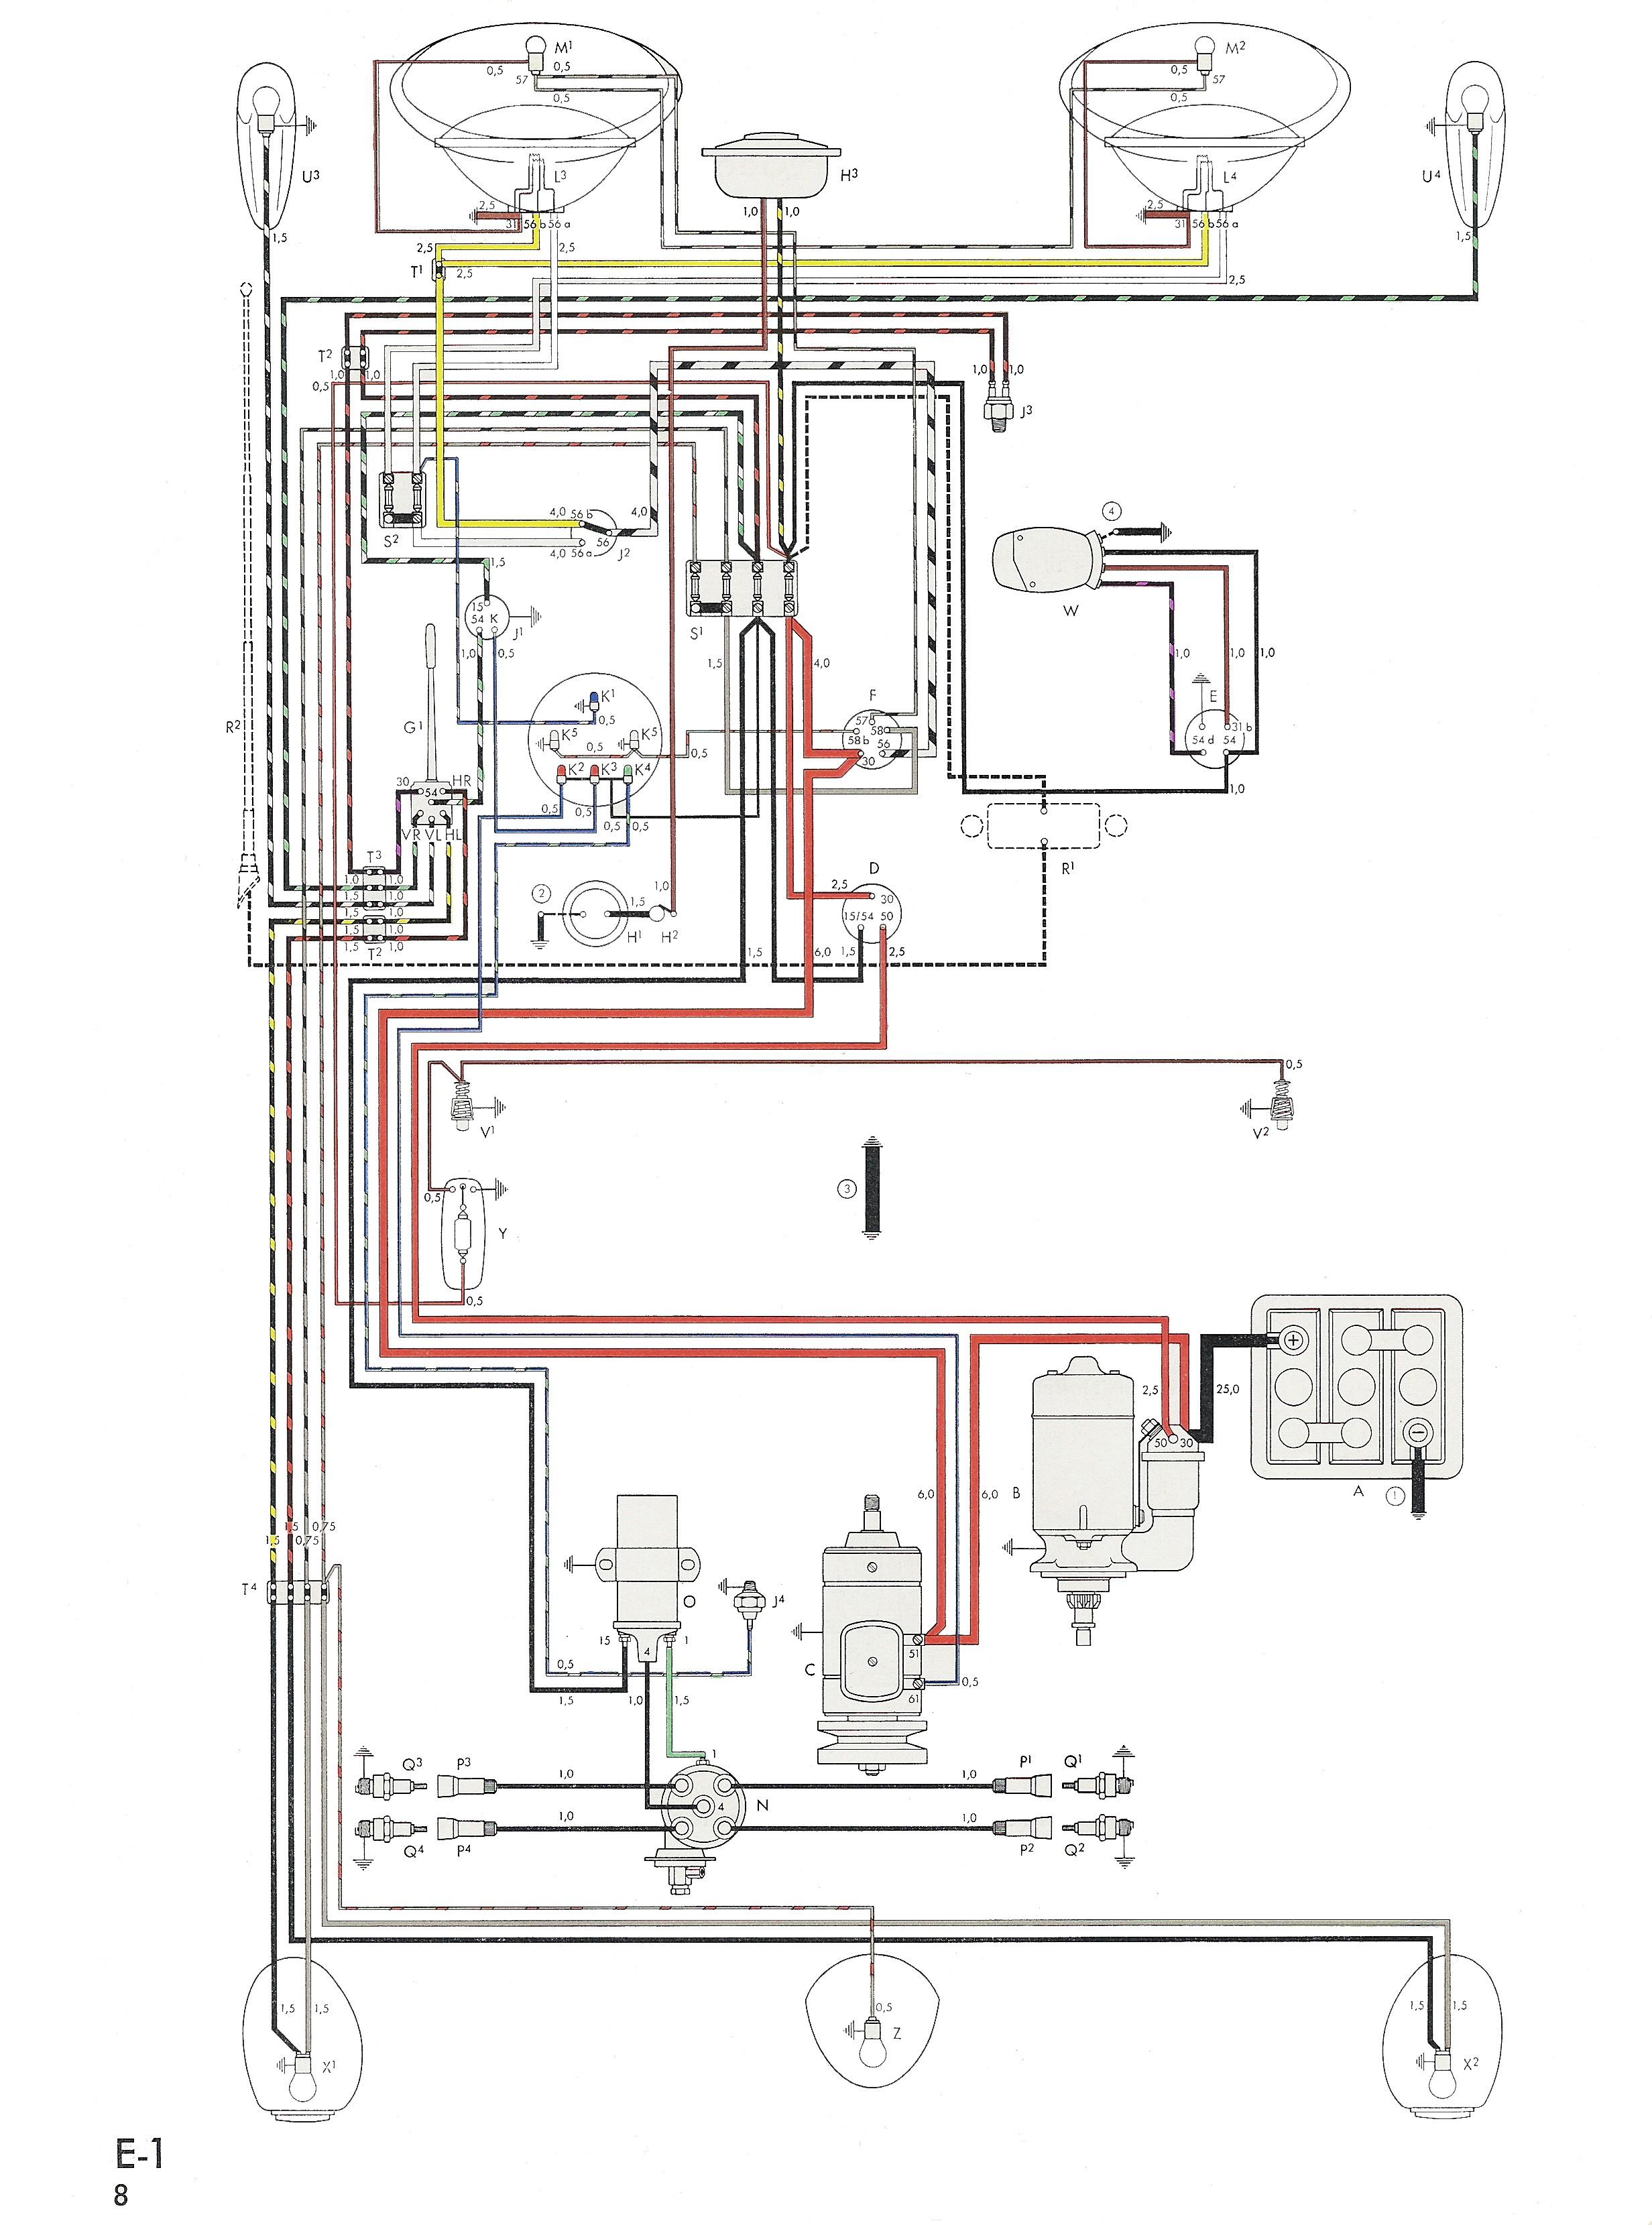 2001 Vw Jetta Engine Diagram 58 Vw Alternator Wiring Another Blog About Wiring Diagram • Of 2001 Vw Jetta Engine Diagram